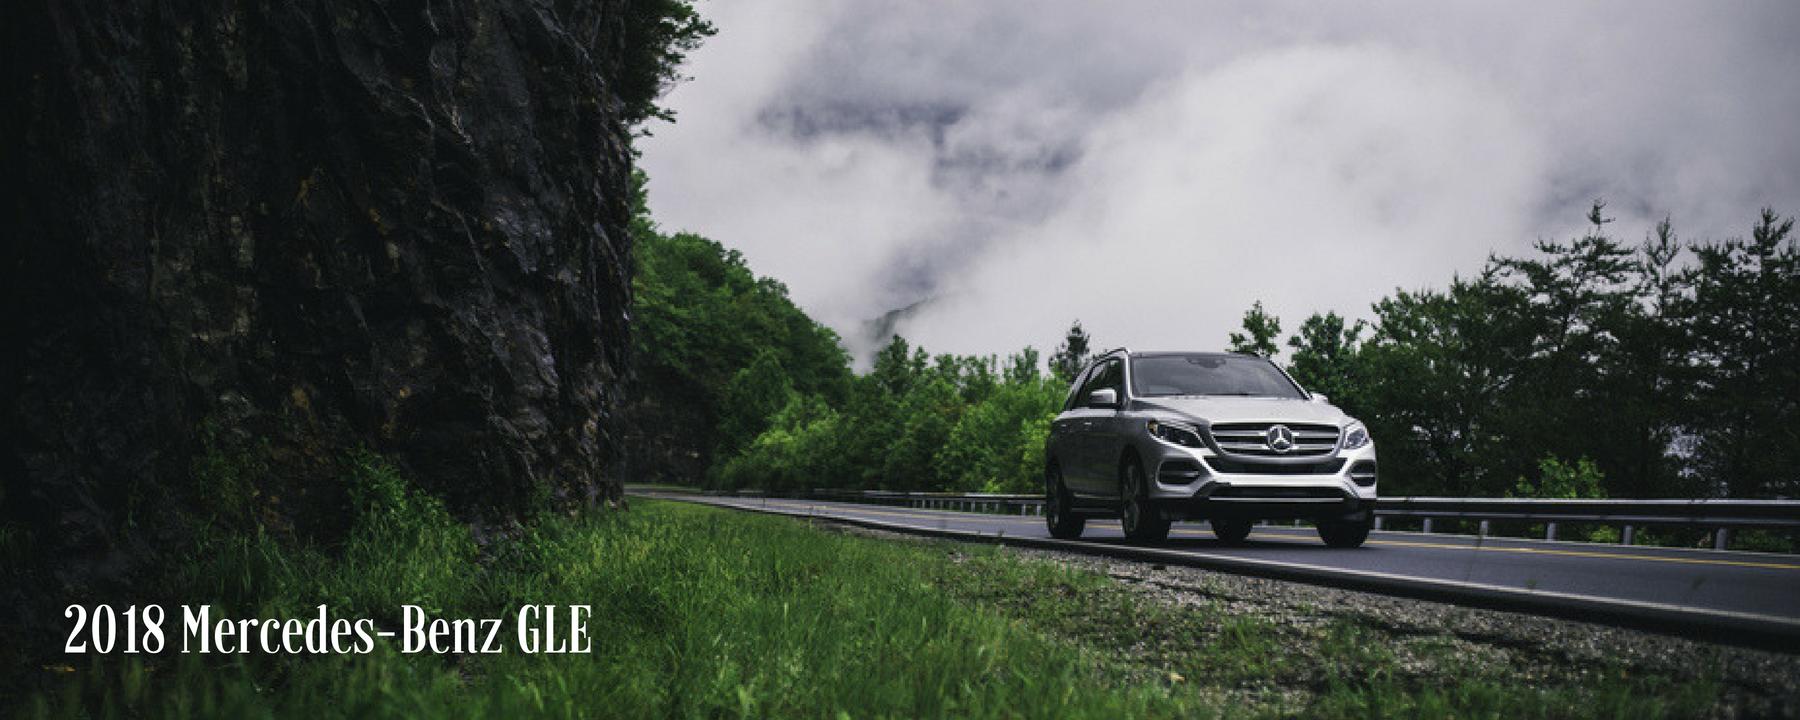 Mercedes-Benz_SUV_GLE